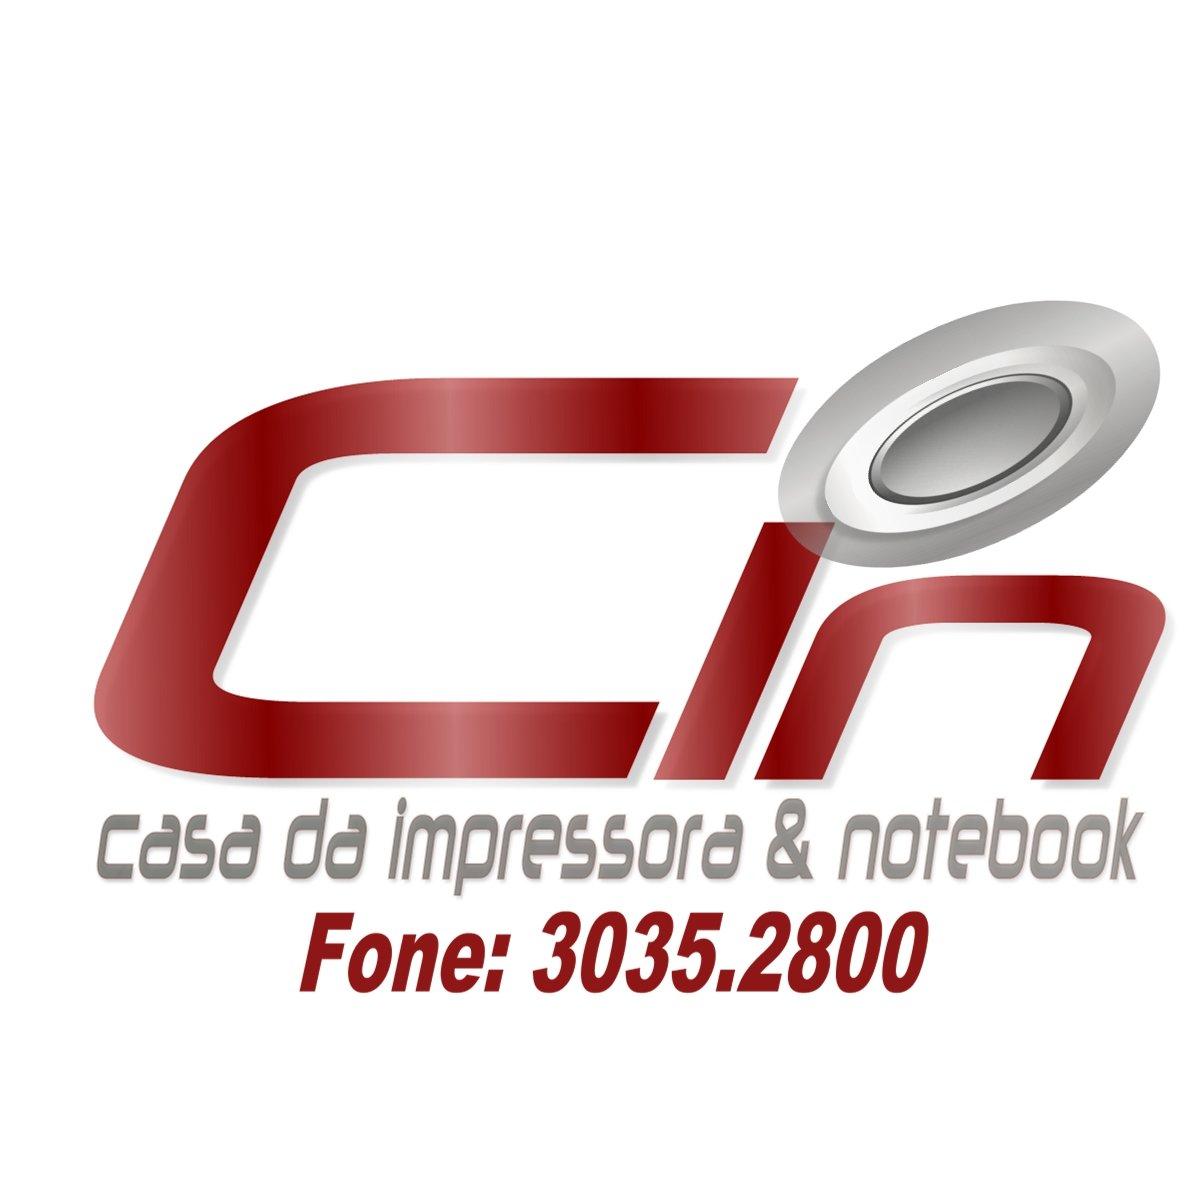 CASA DA IMPRESSORA